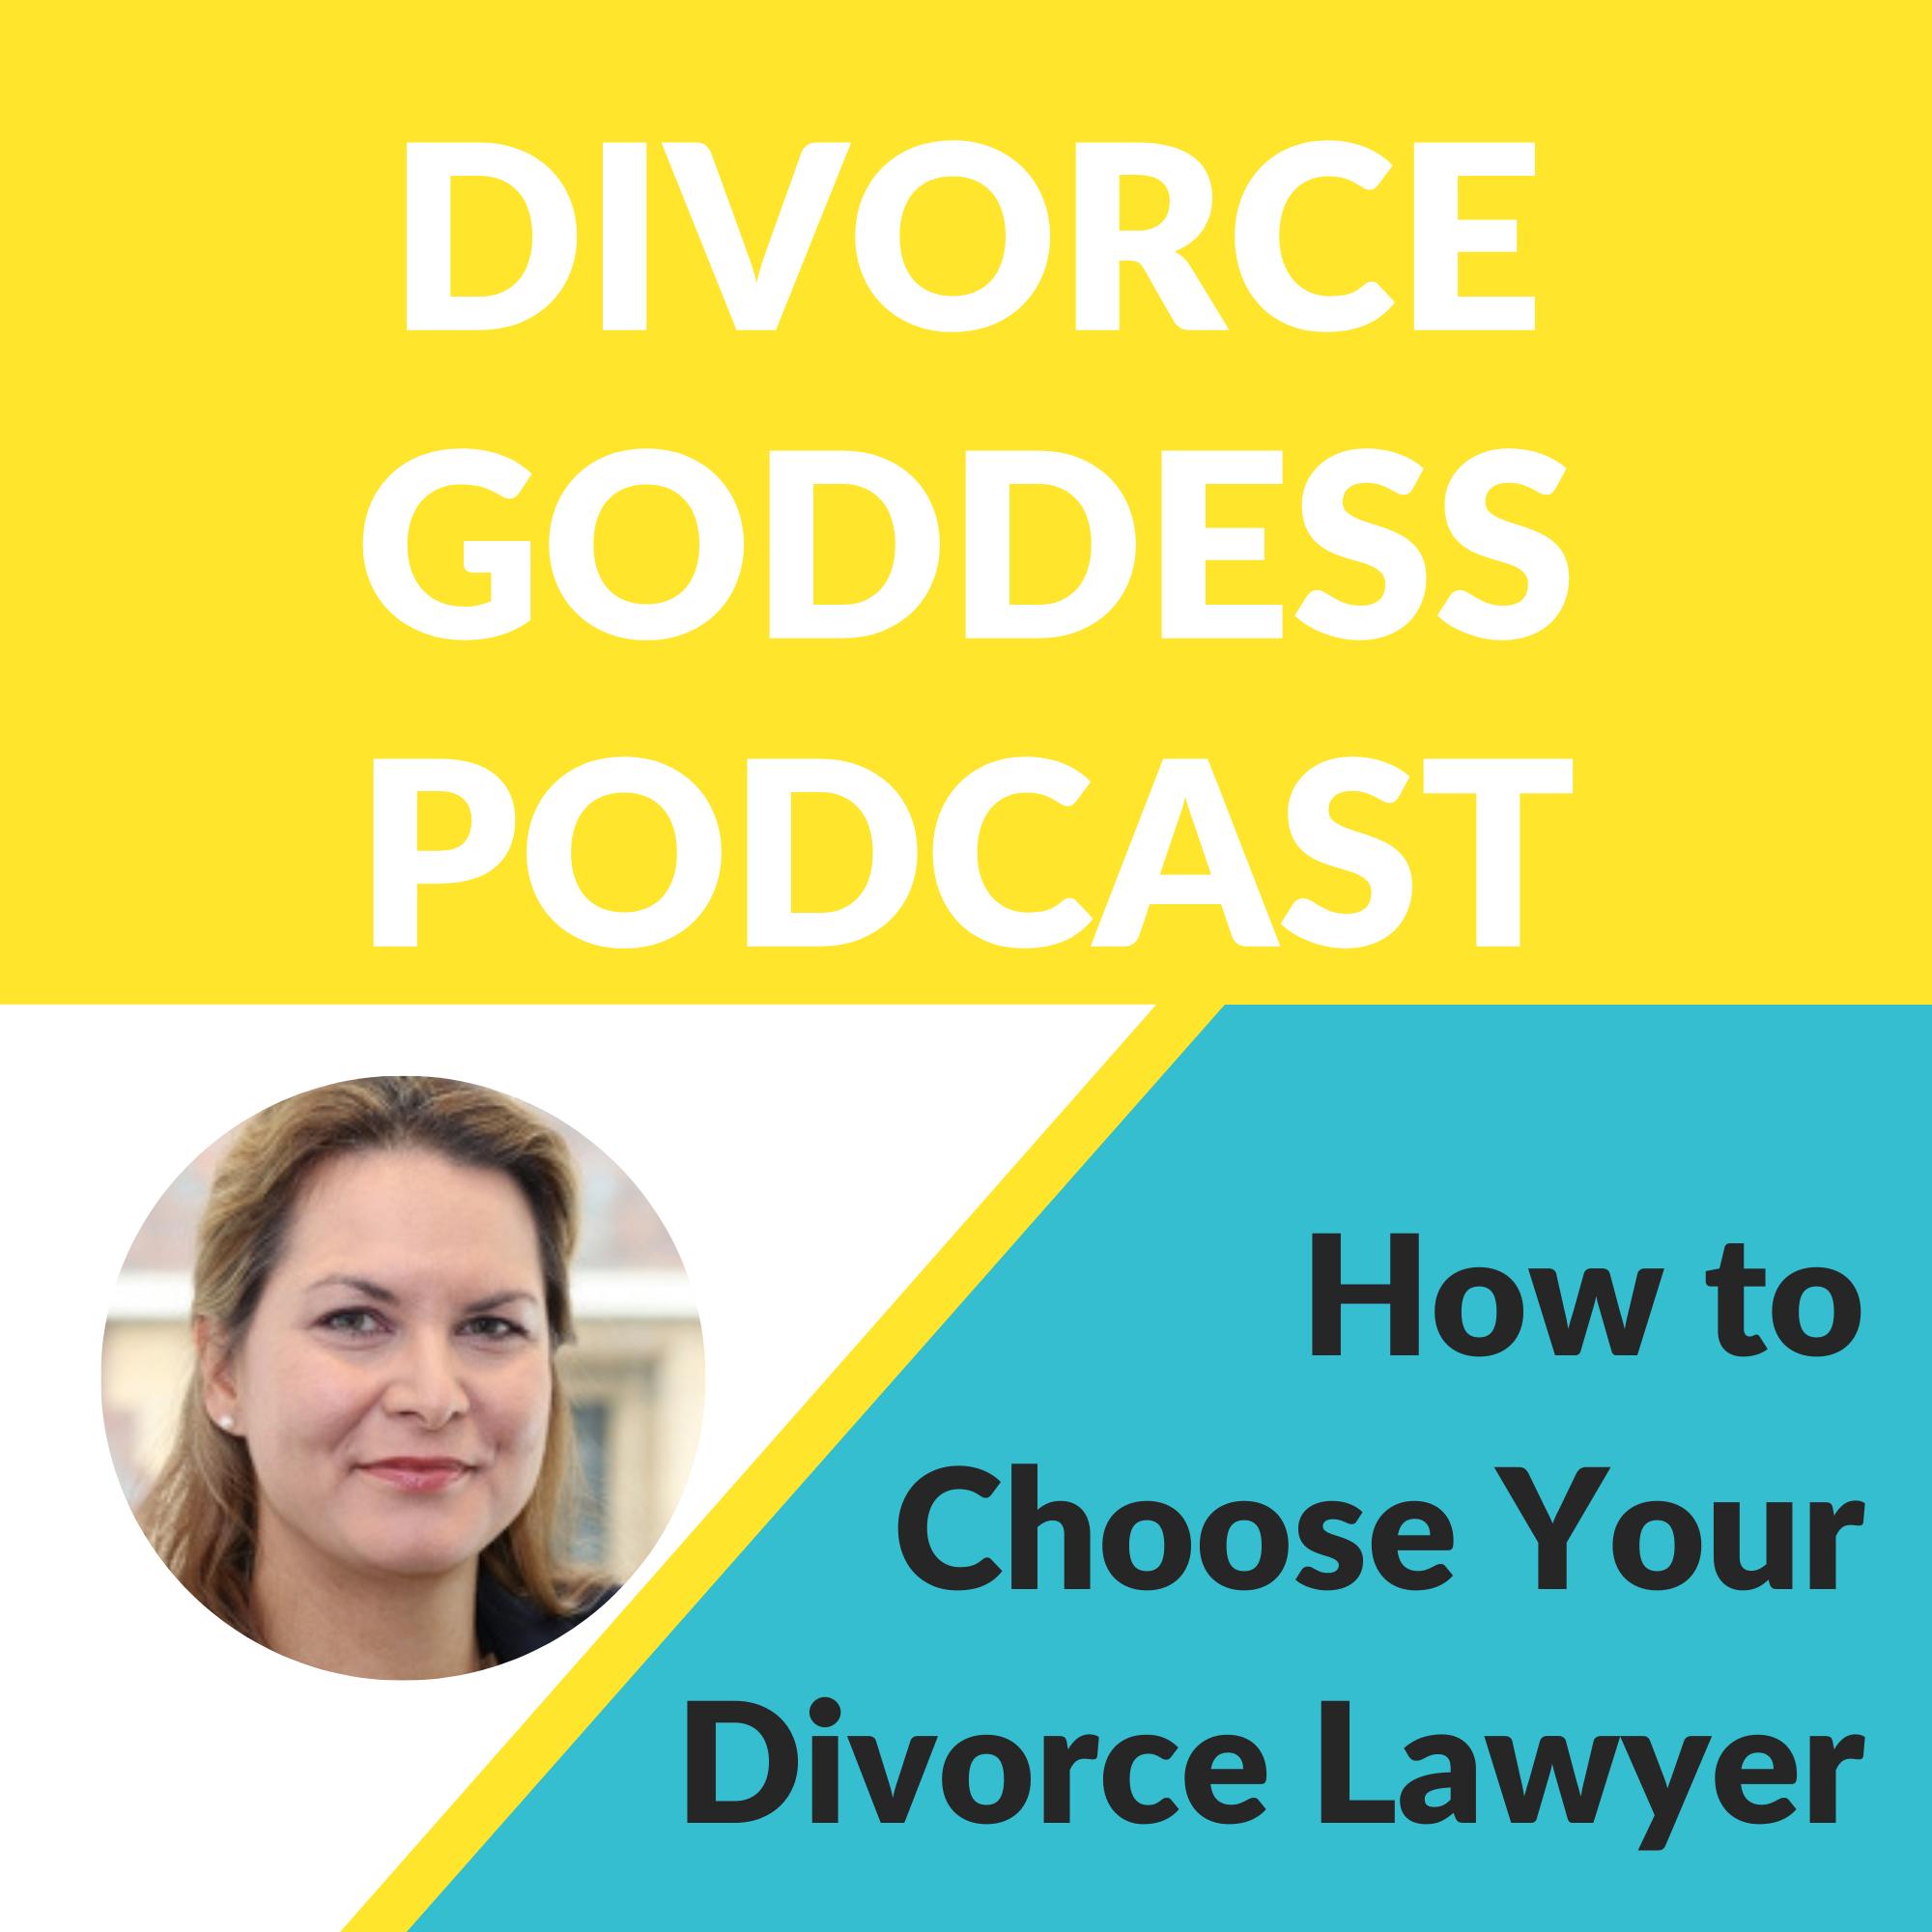 Divorce Goddess Podcast - How to Choose Your Divorce Lawyer